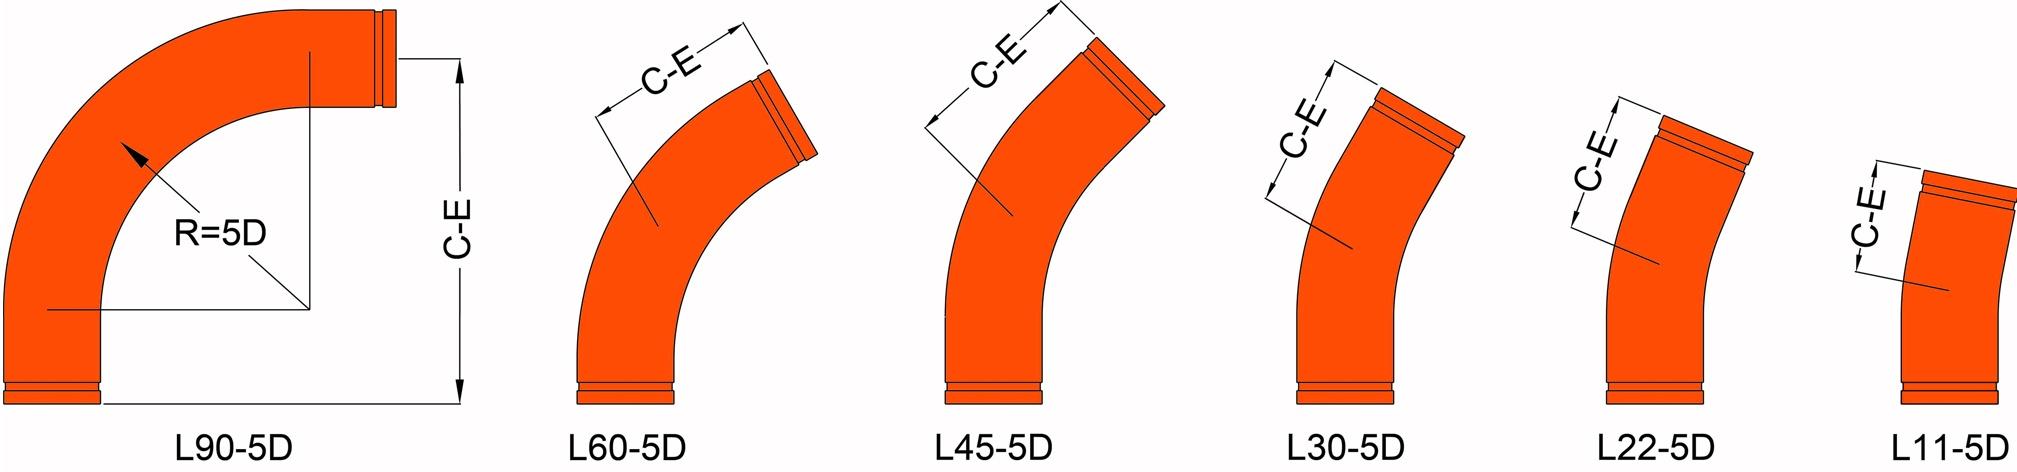 5D Elbow Dimensions